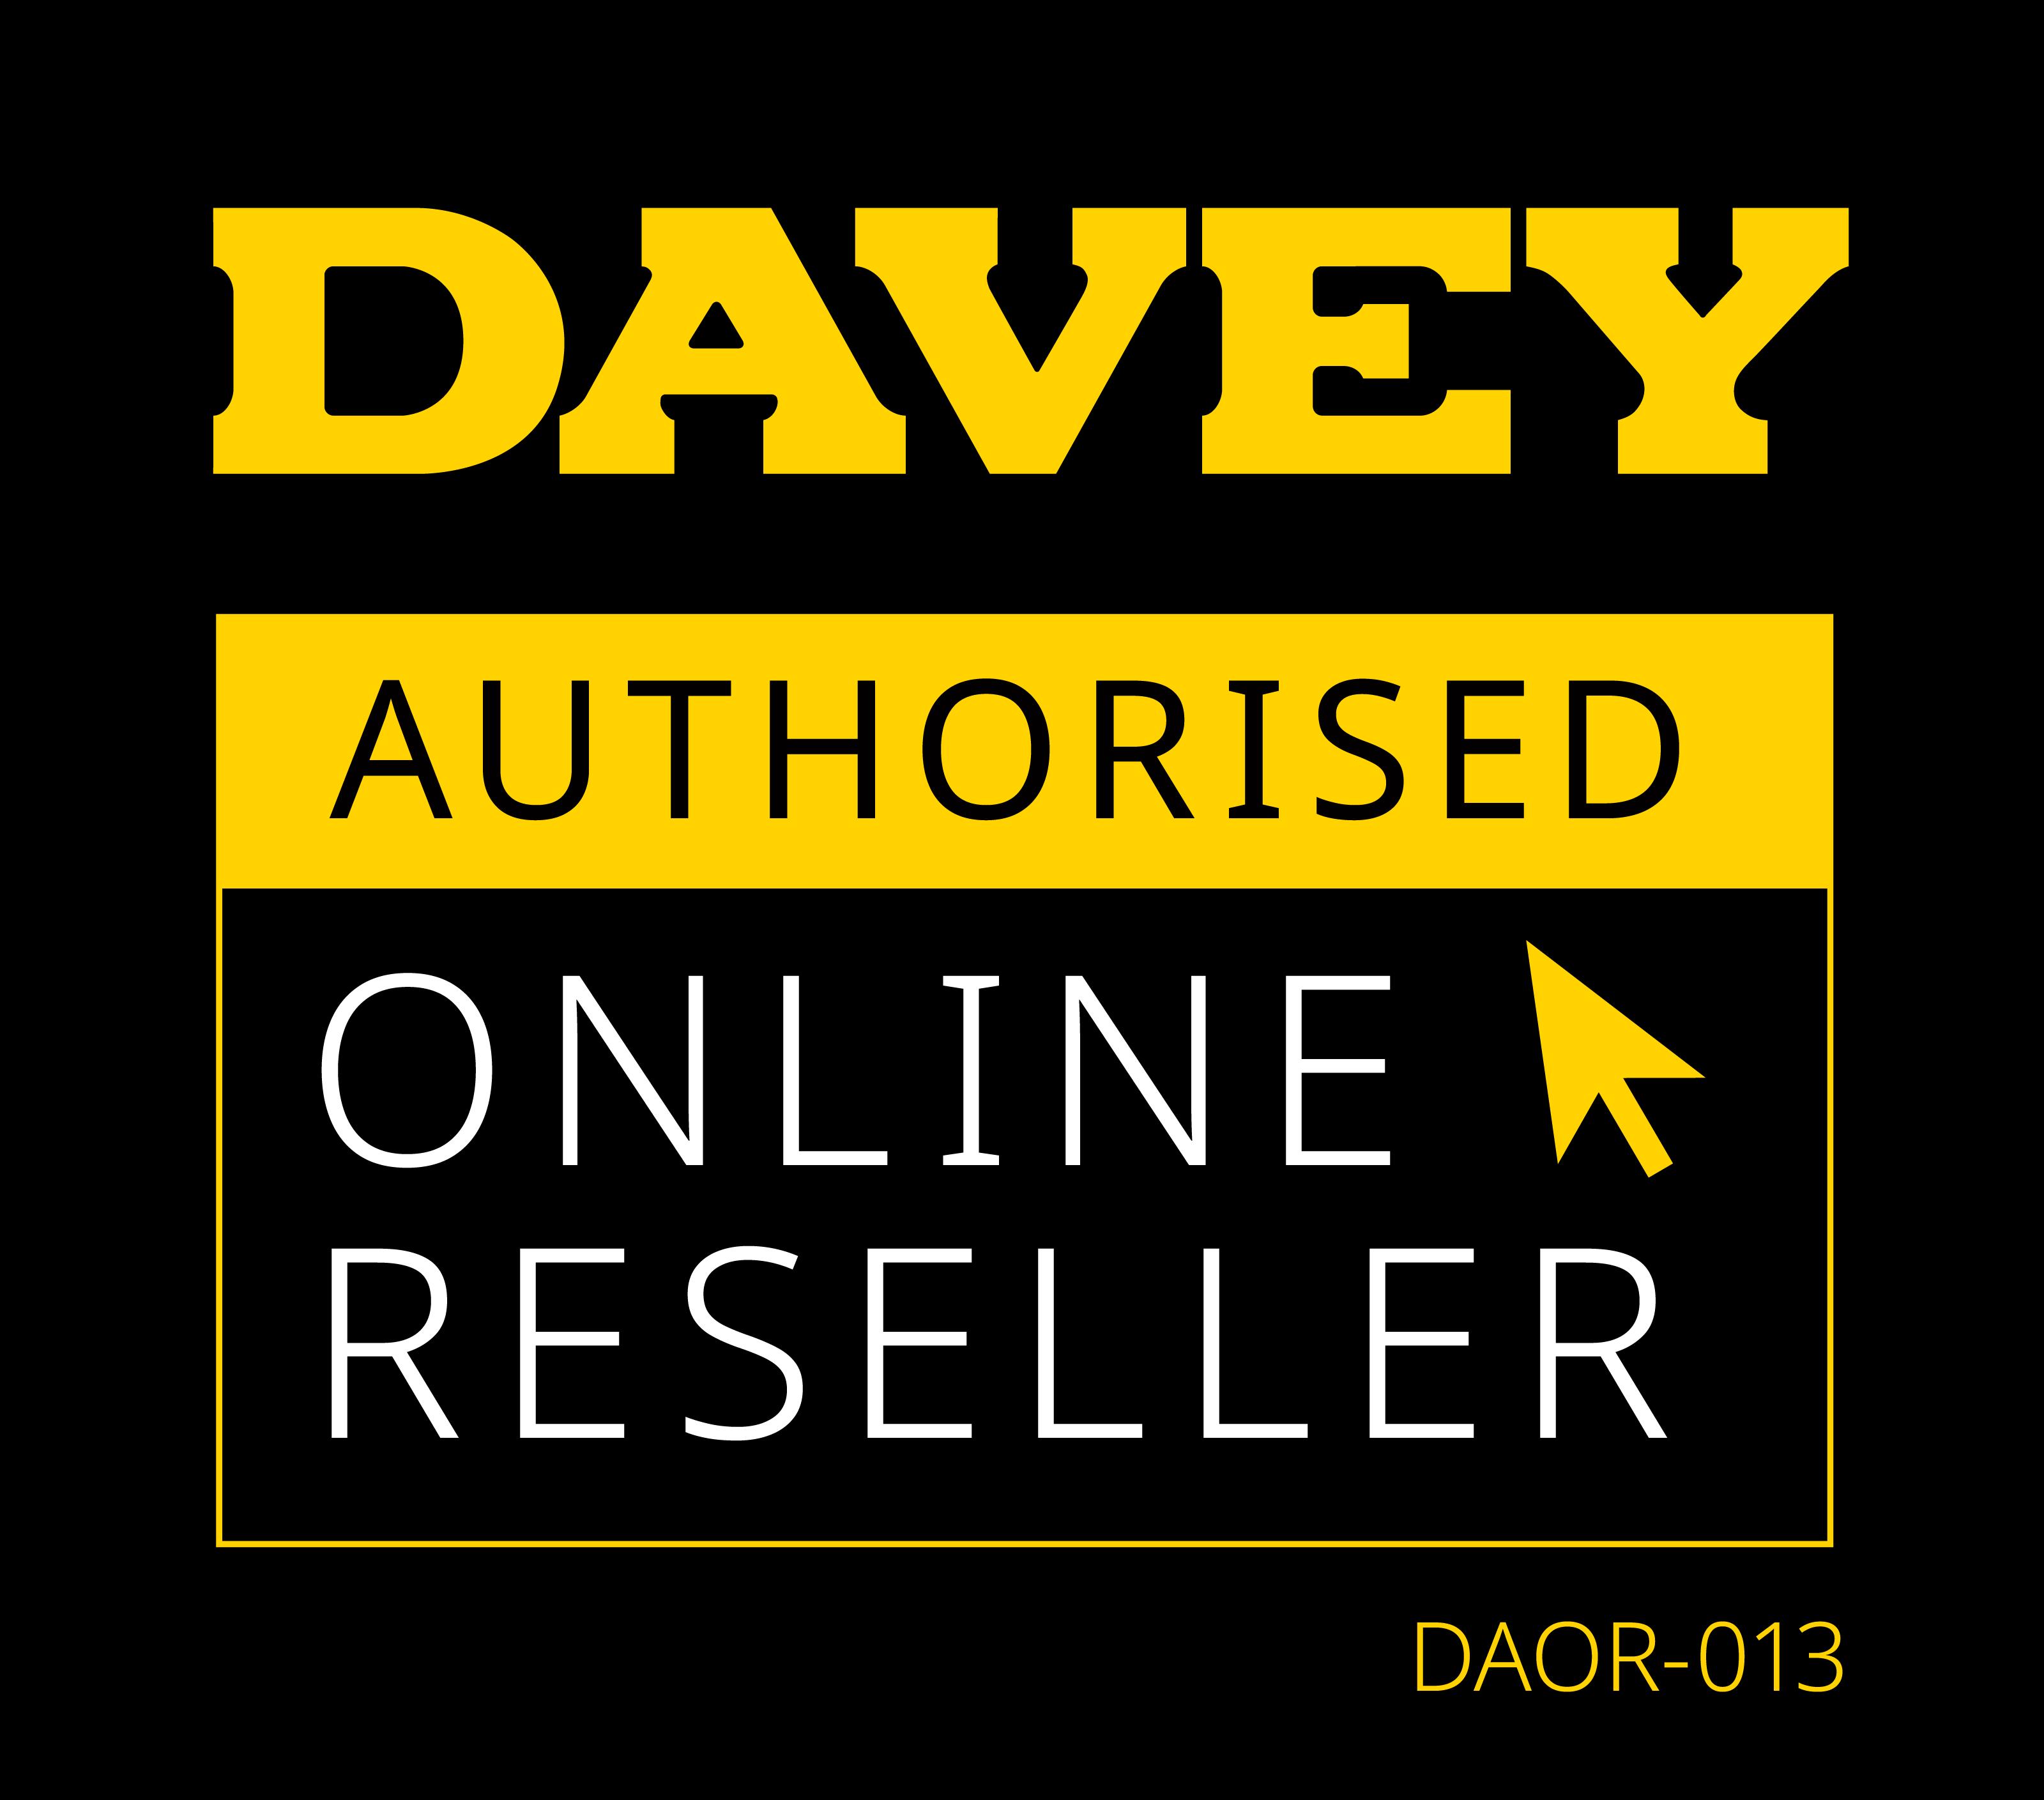 Davey Authorised Online Reseller